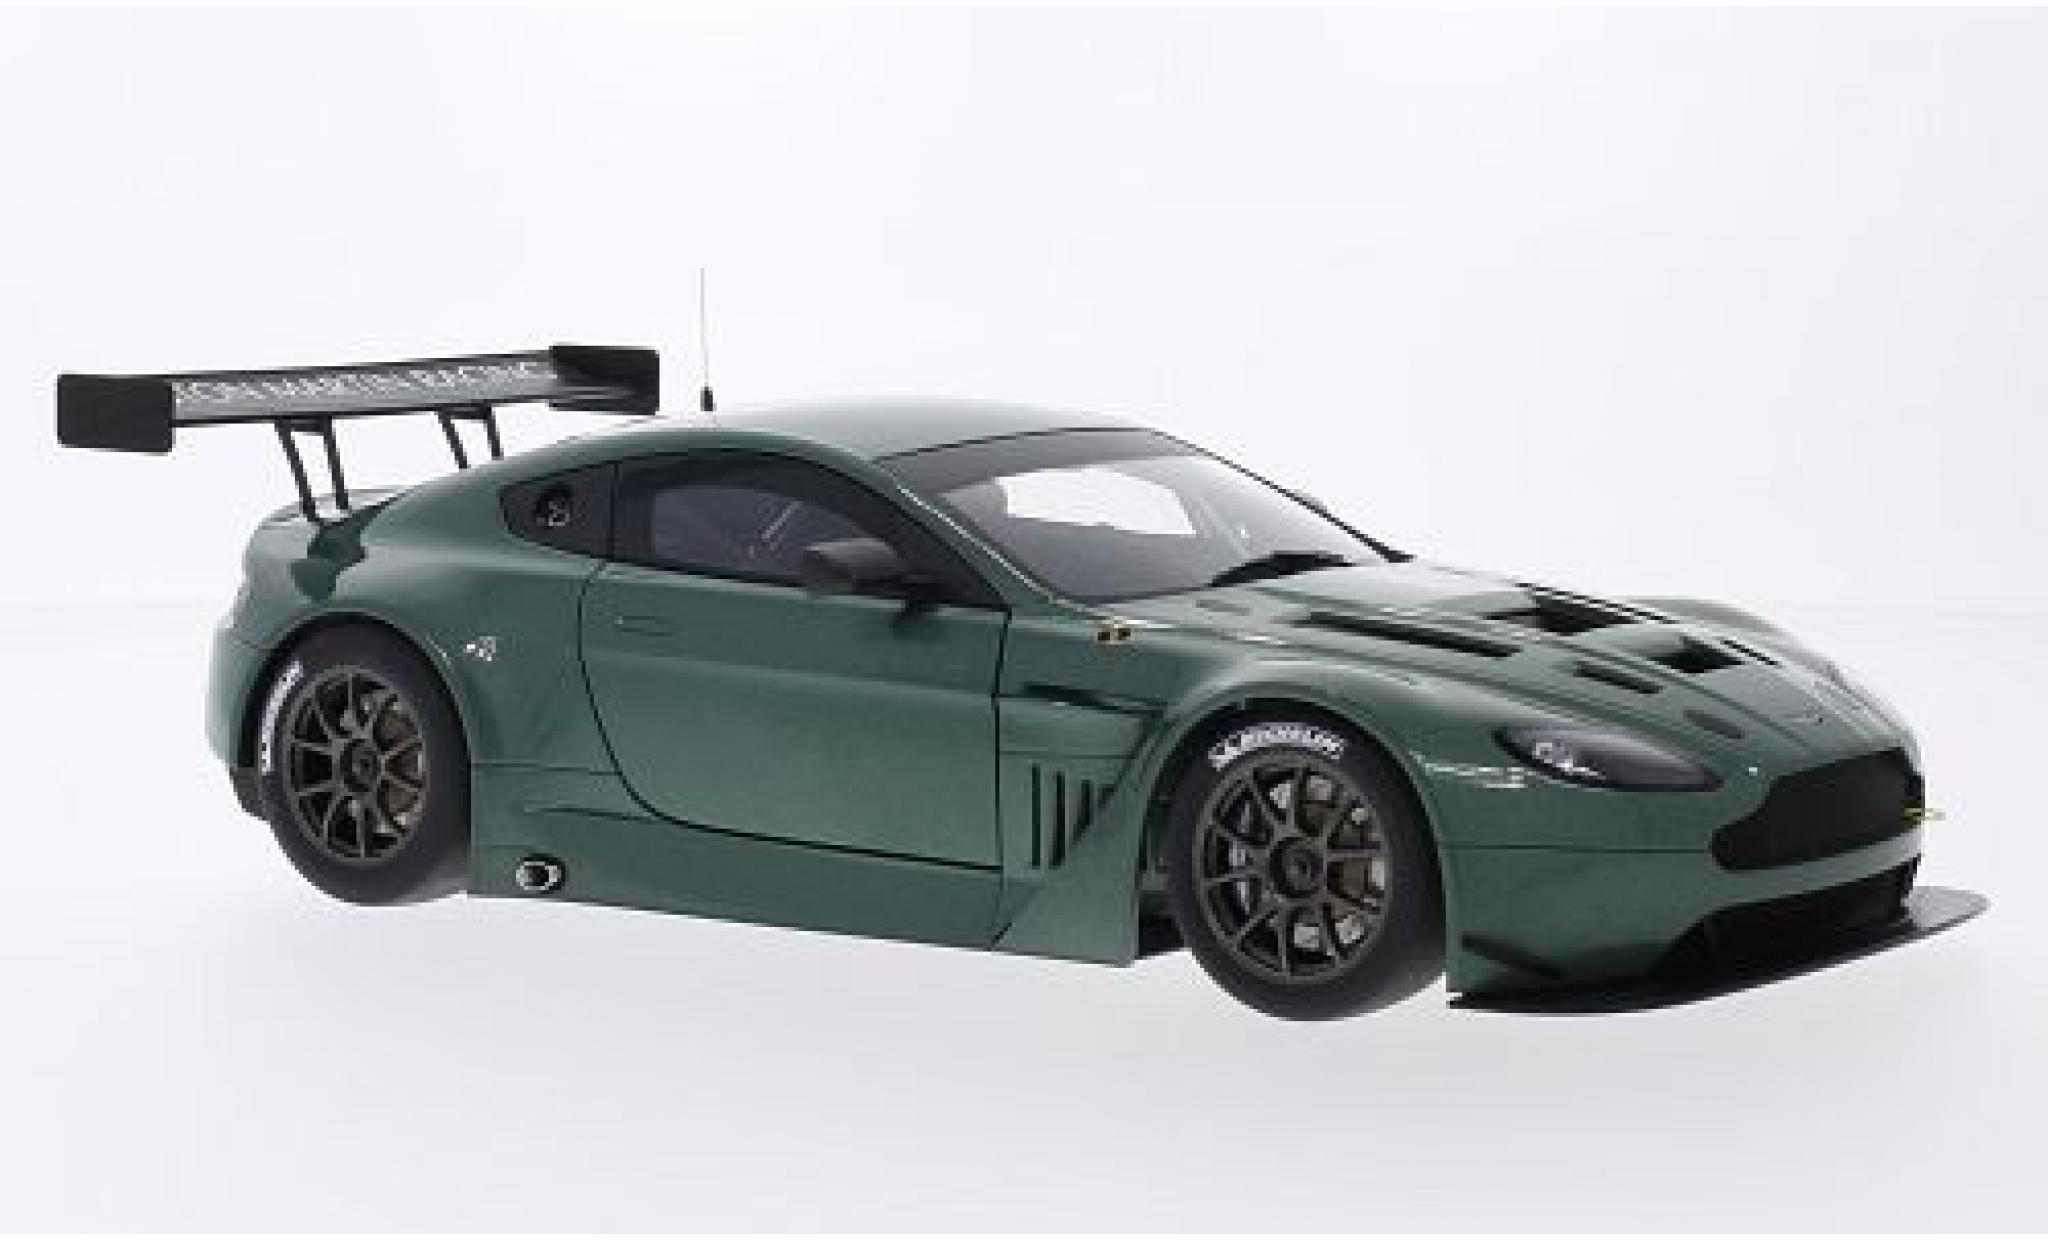 Aston Martin Vantage 1/18 AUTOart V12 GT3 metallise verte 2013 Plain Body Version